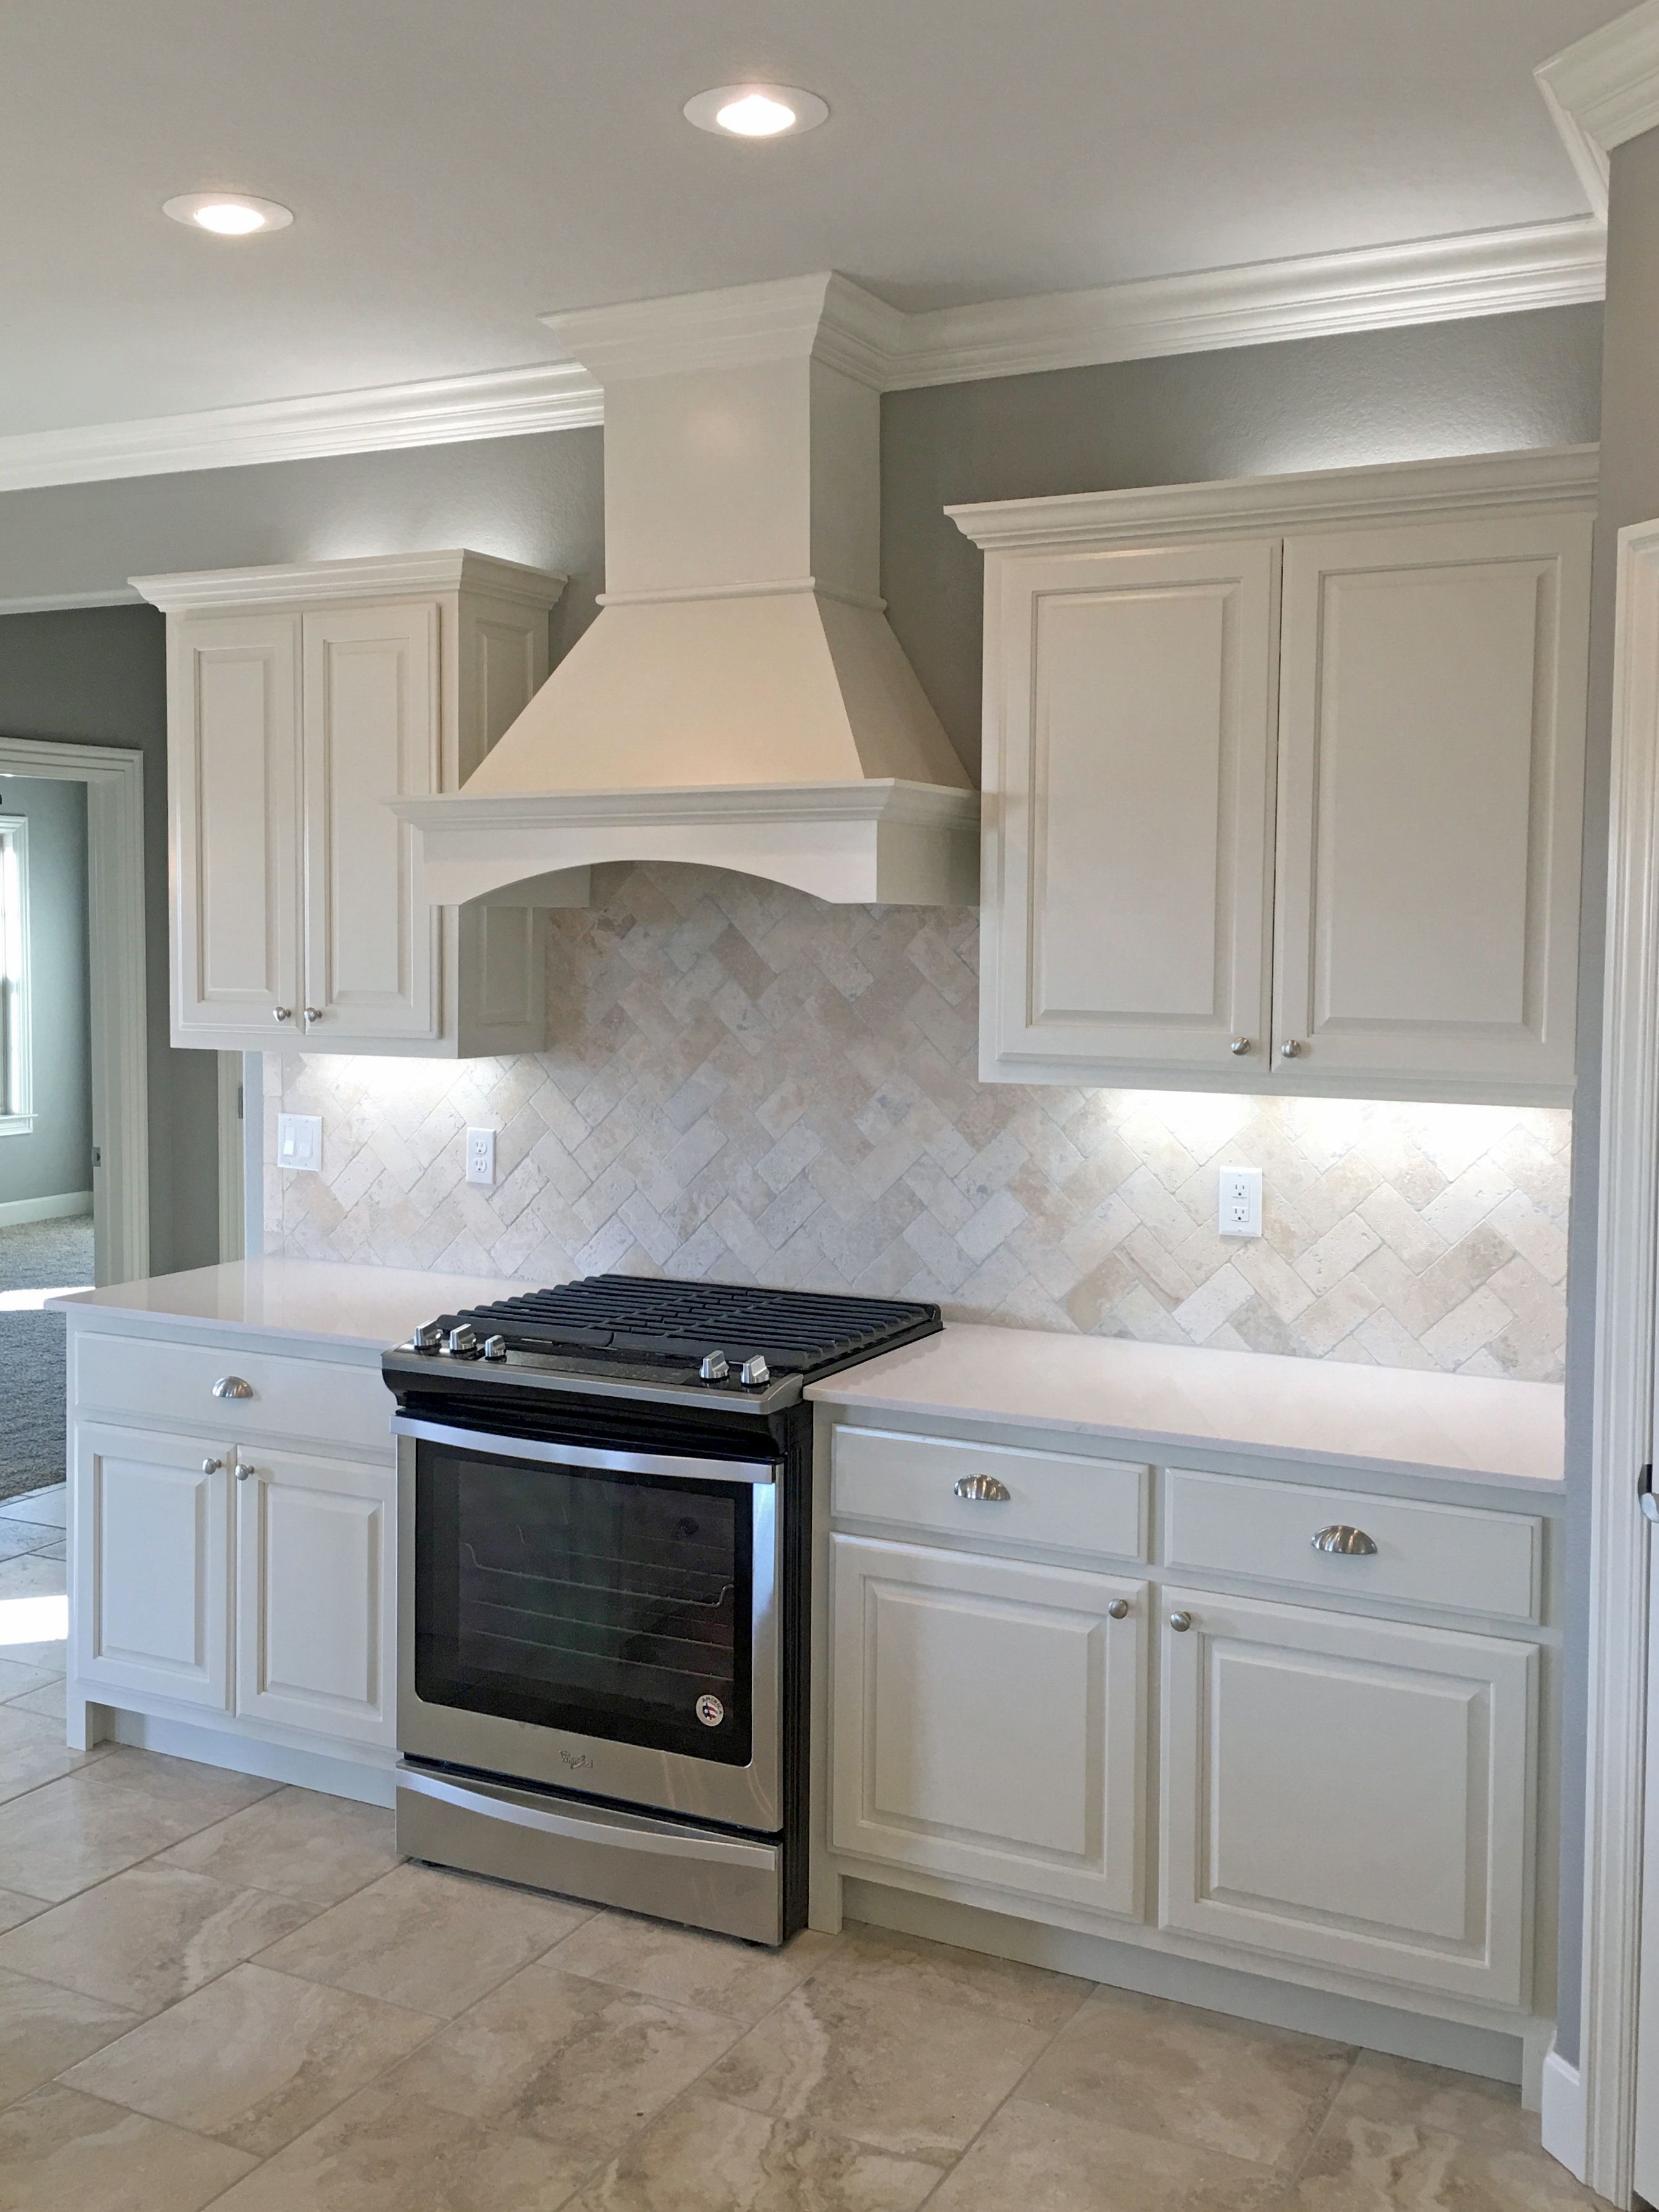 White kitchen with satin nickel fixtures, pendant lights, travertine ...